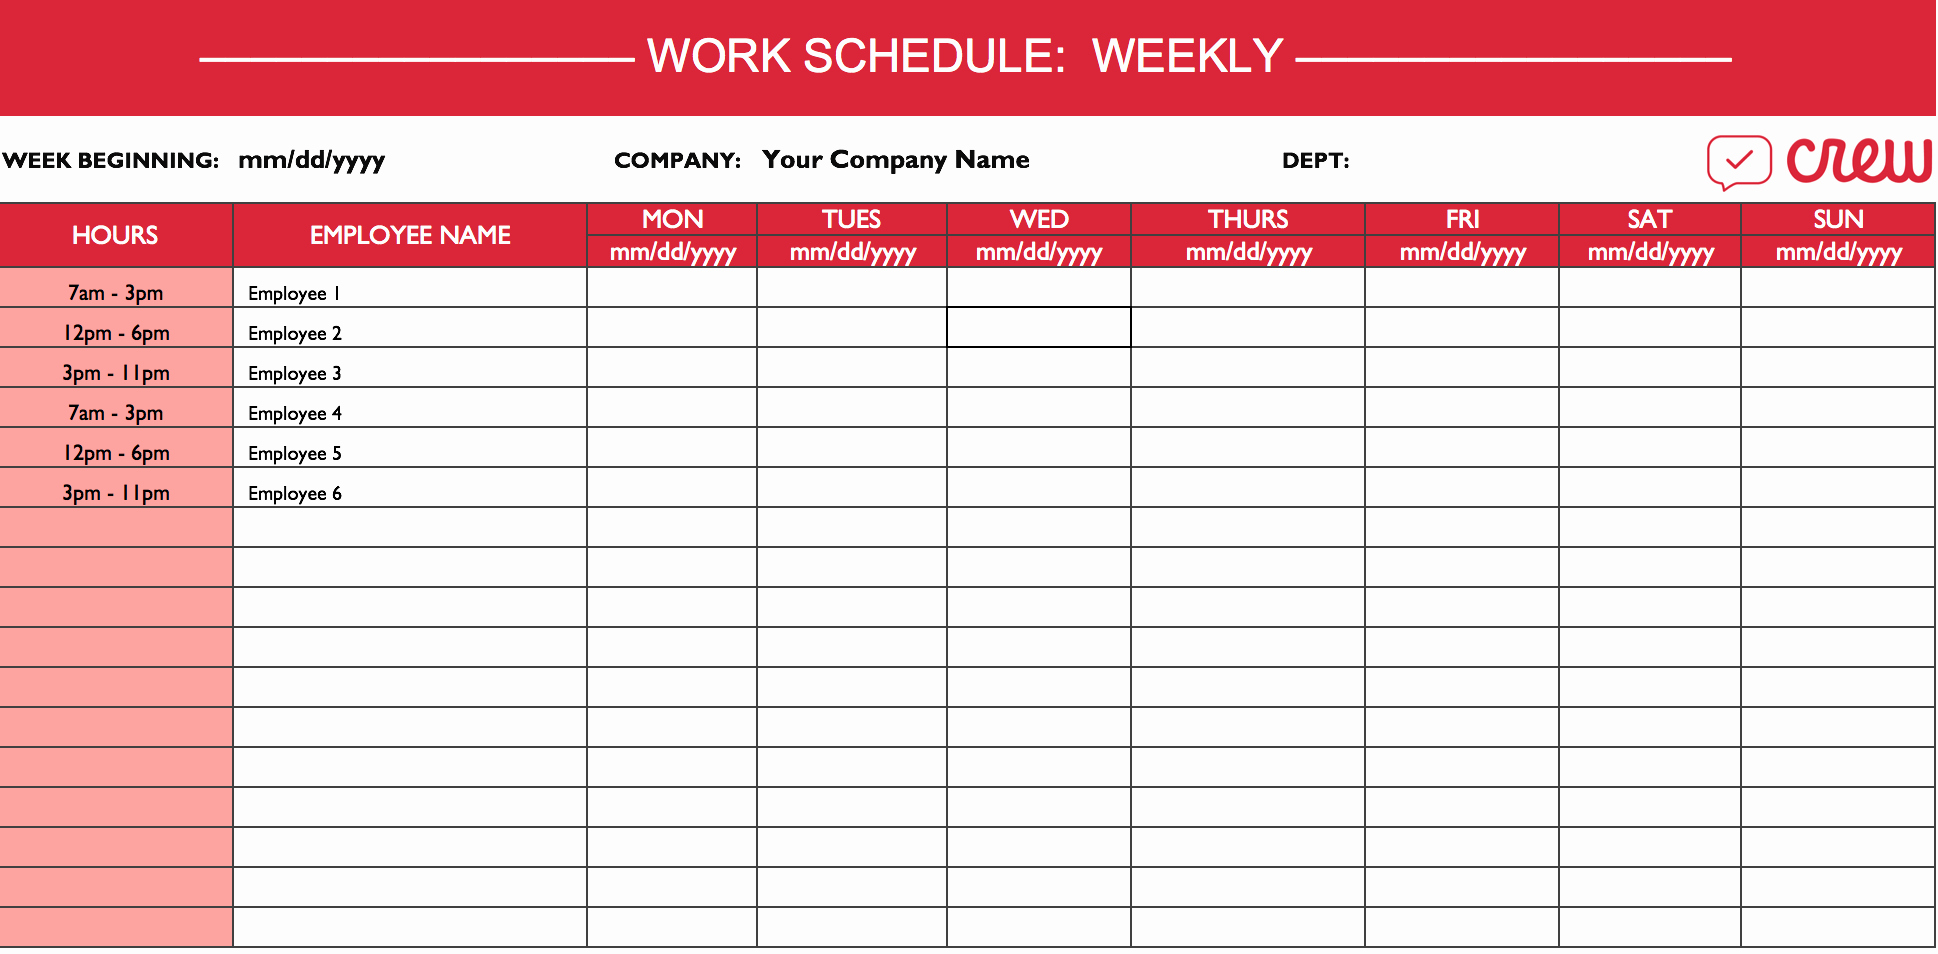 Shift Work Calendar Template Luxury Weekly Work Schedule Template I Crew